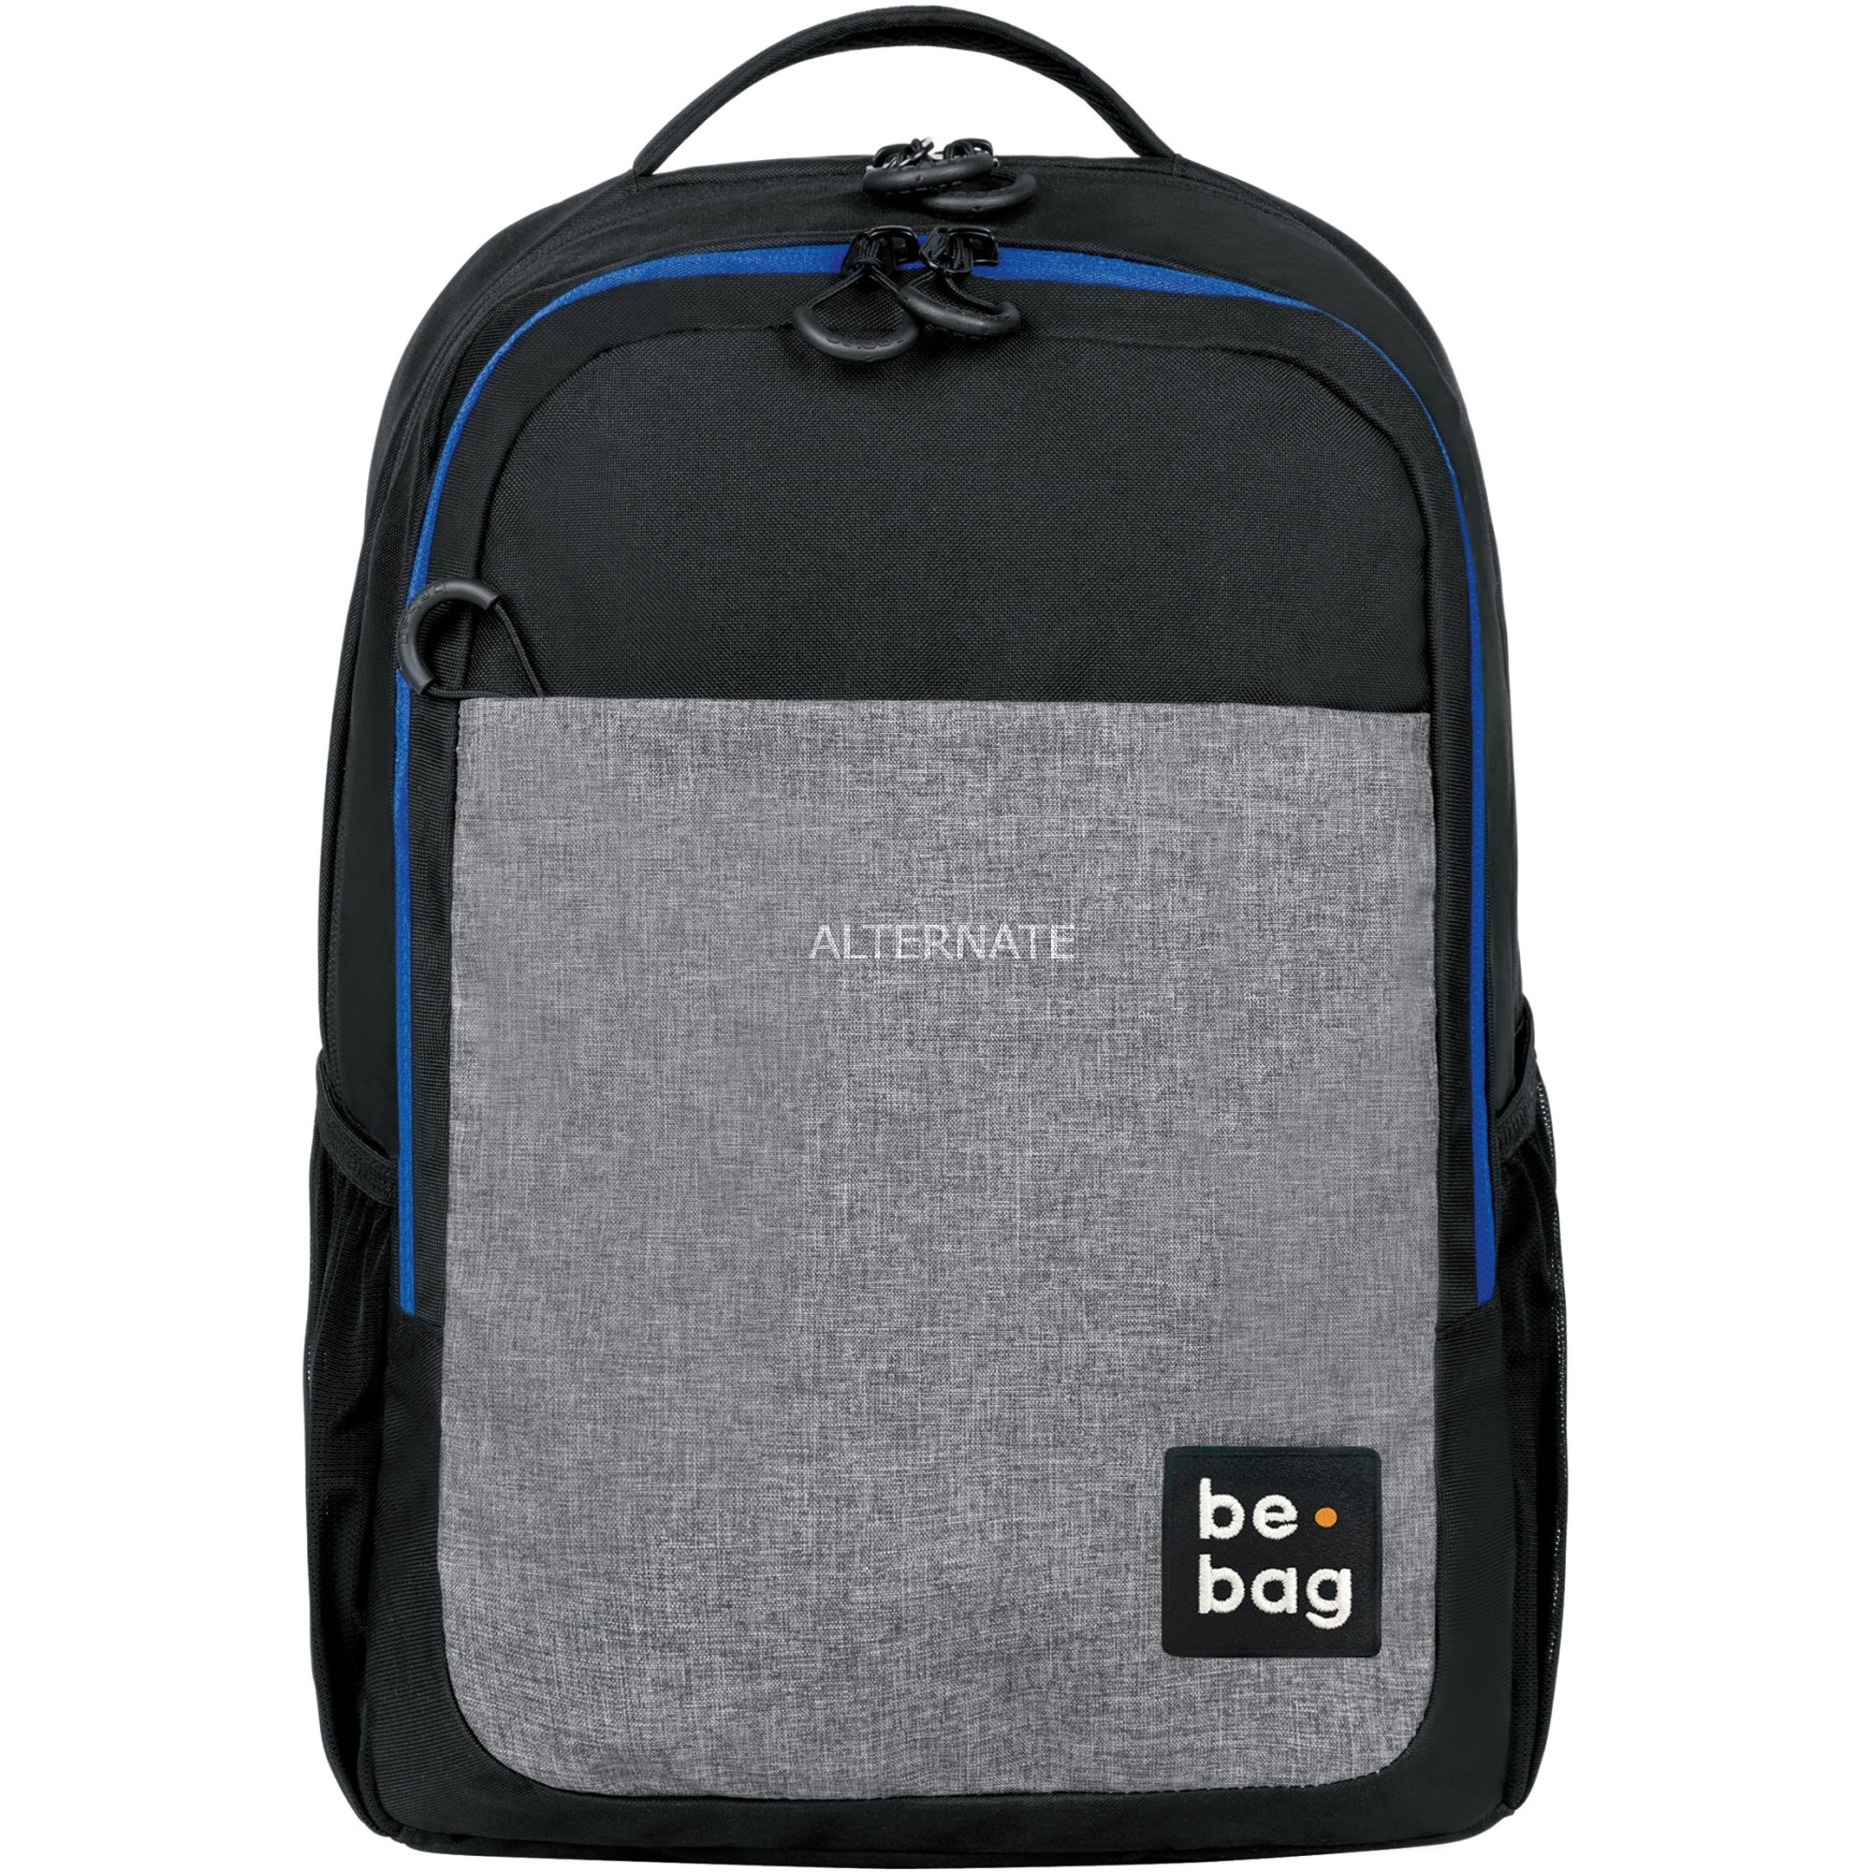 be.bag be.clever Niño/niña School backpack Negro, Azul, Gris Poliéster, Mochila